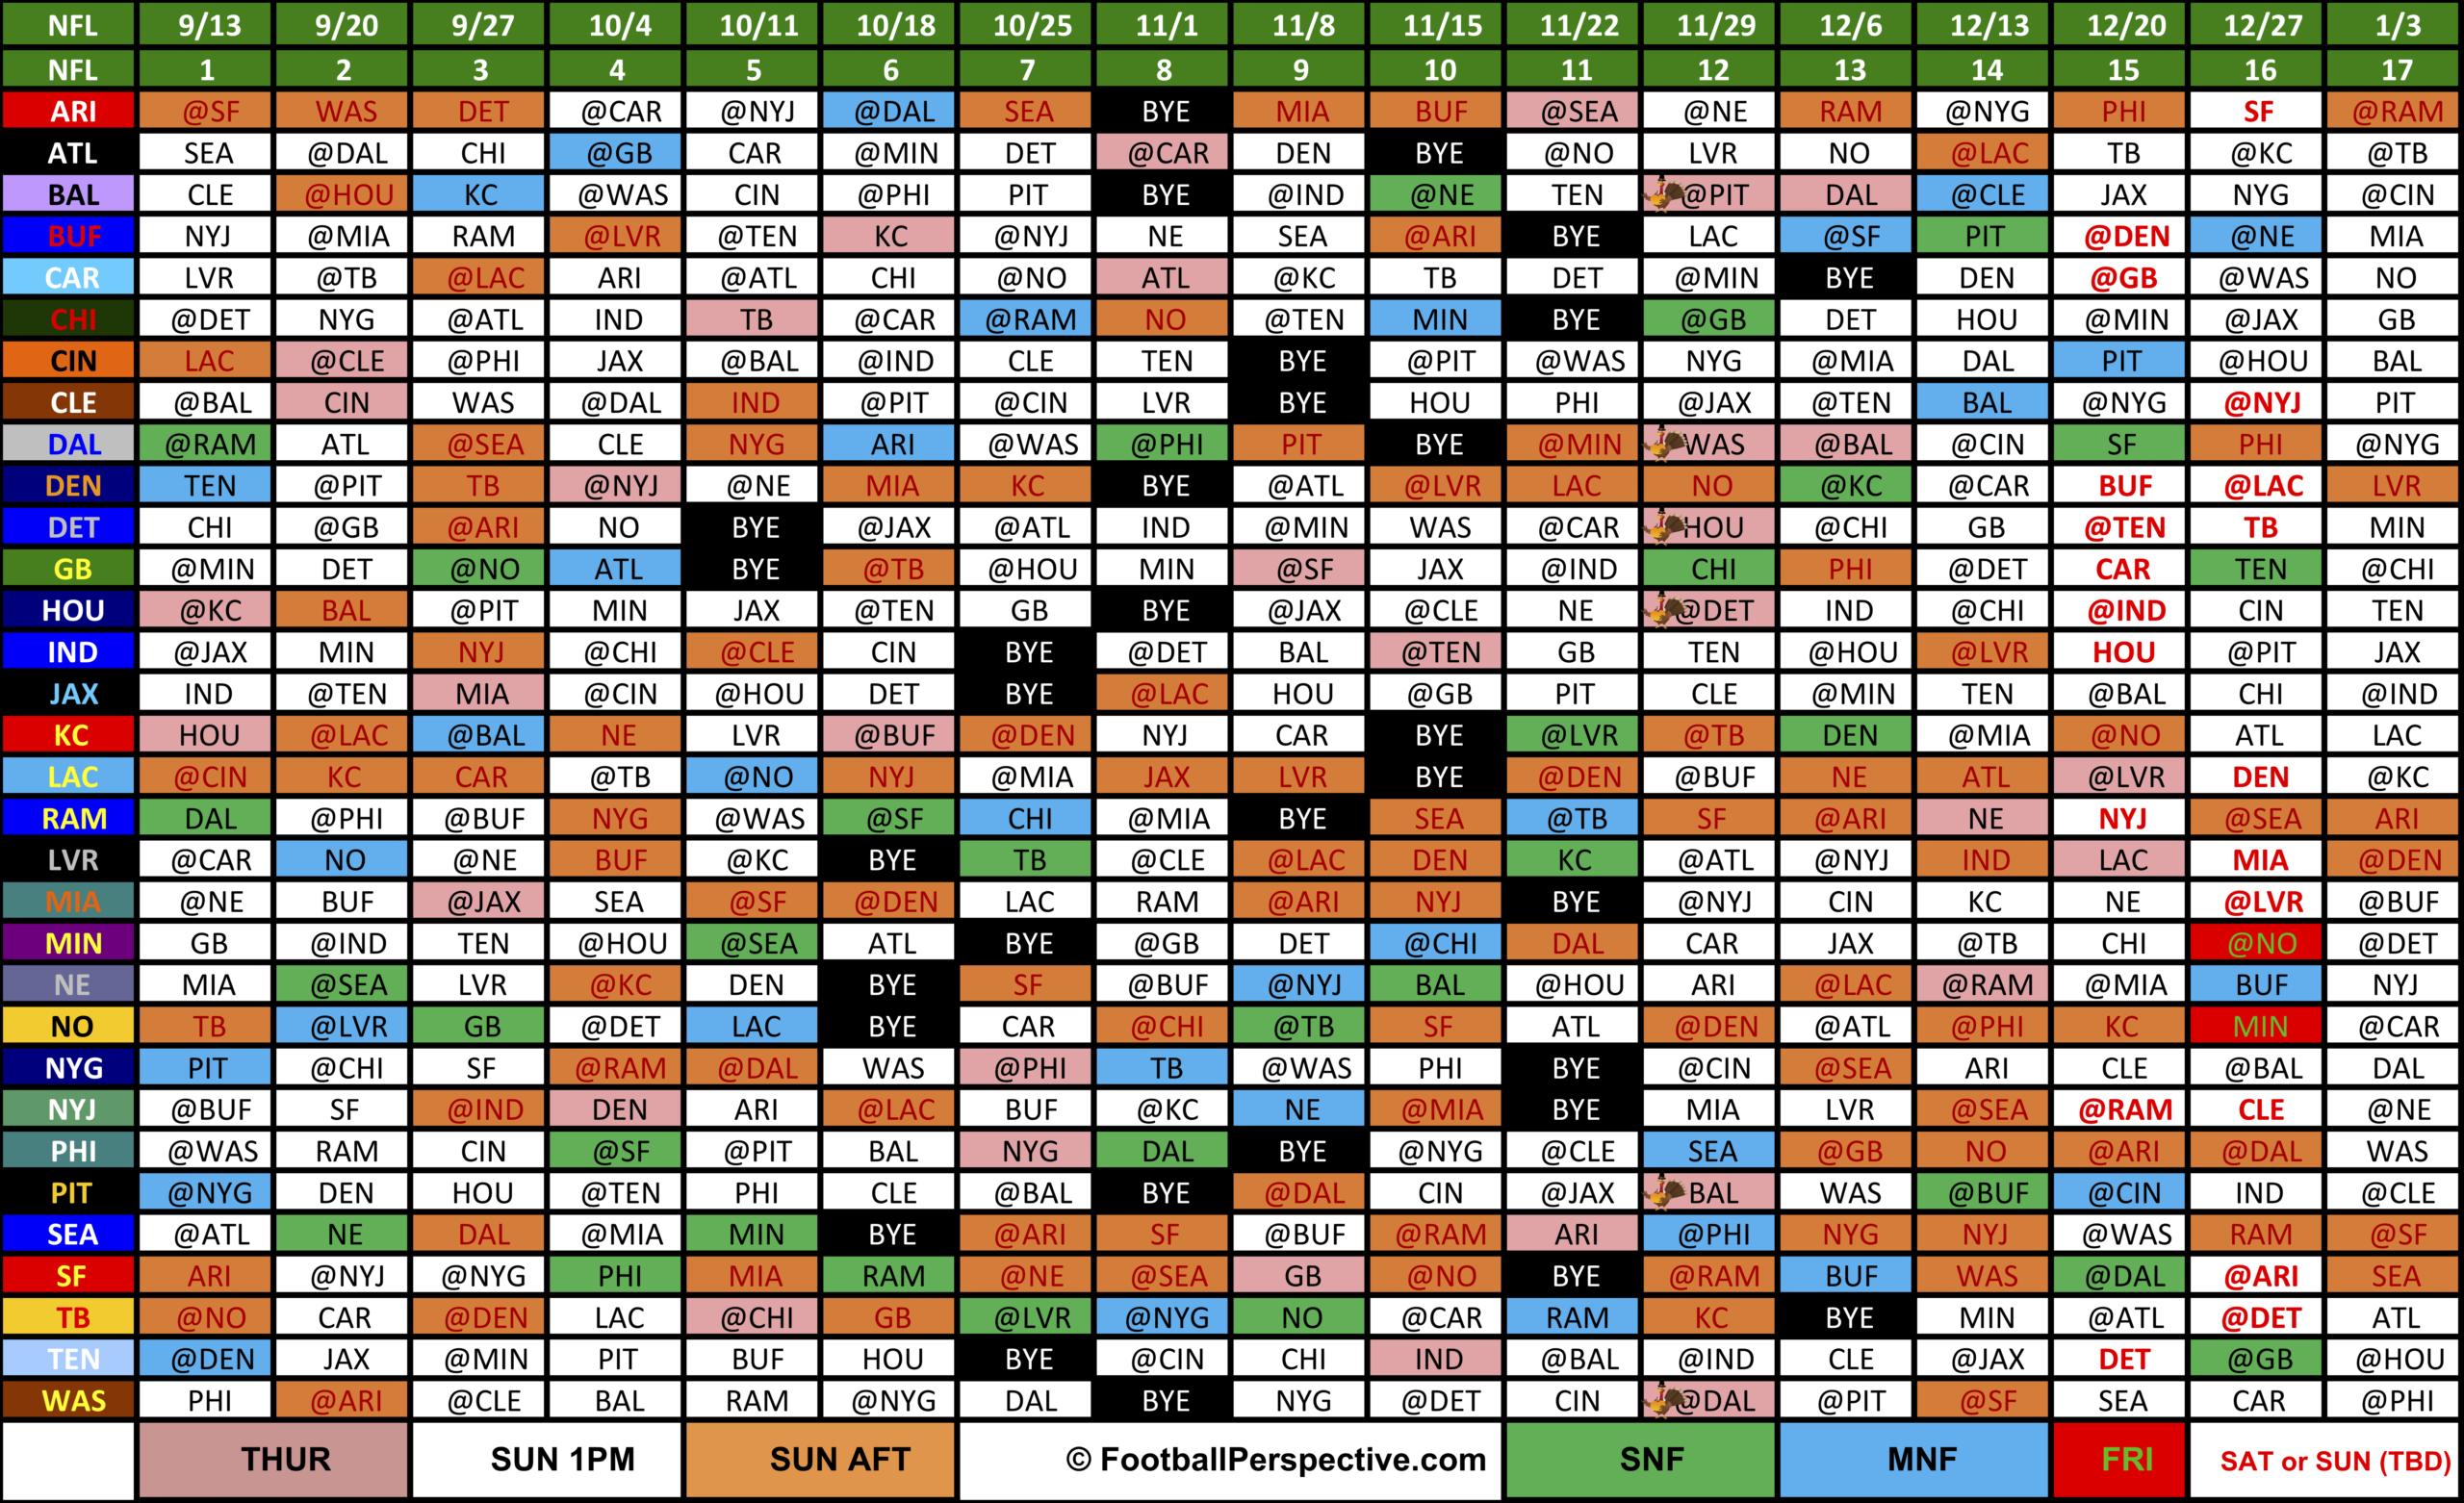 The 2020 Nfl Schedule